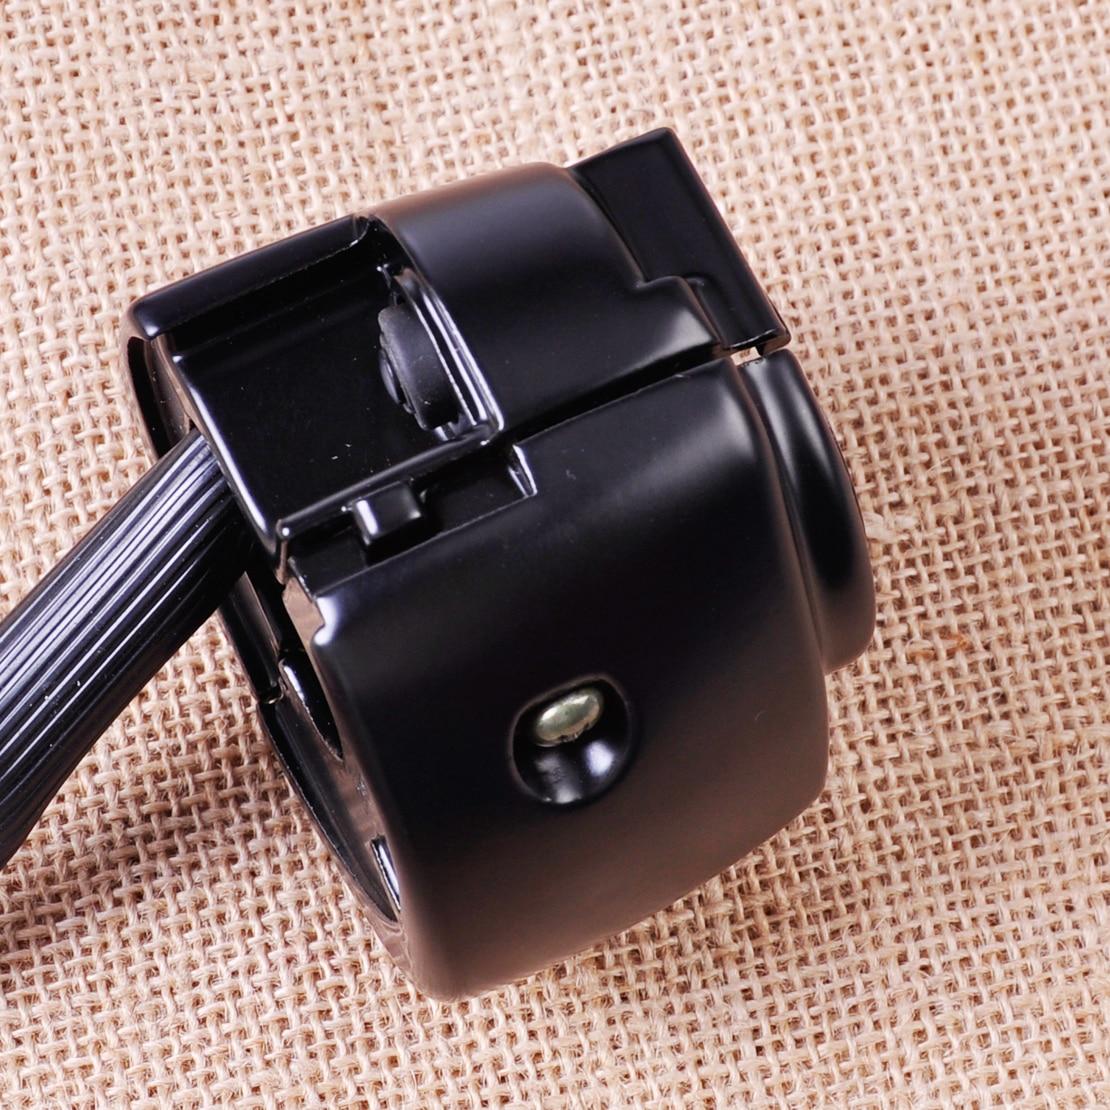 Harley Davidson Rear Speaker Wiring Harness : Harley davidson rear speaker wiring harness diagram auto